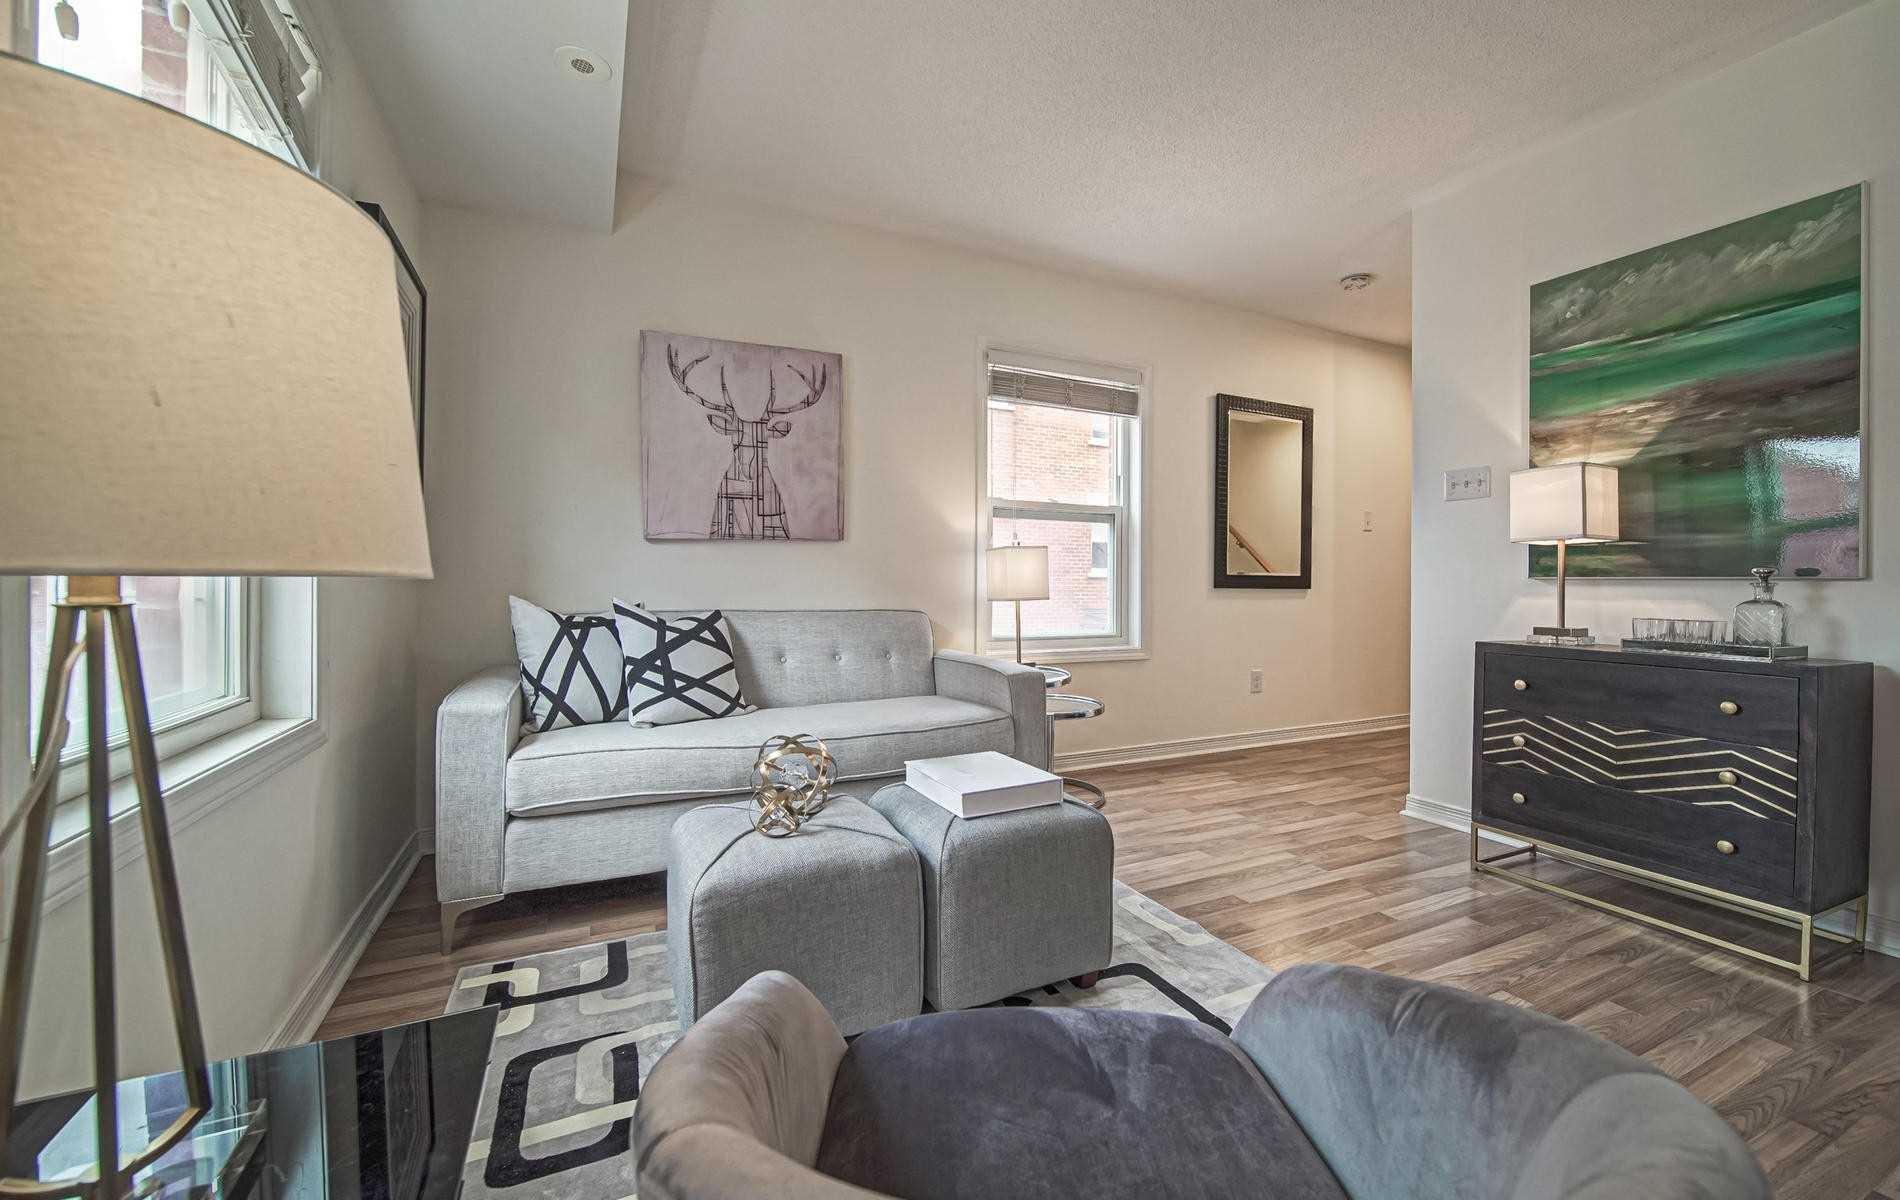 Photo 4: Photos: 3 78 Munro Street in Toronto: South Riverdale Condo for sale (Toronto E01)  : MLS®# E4615987